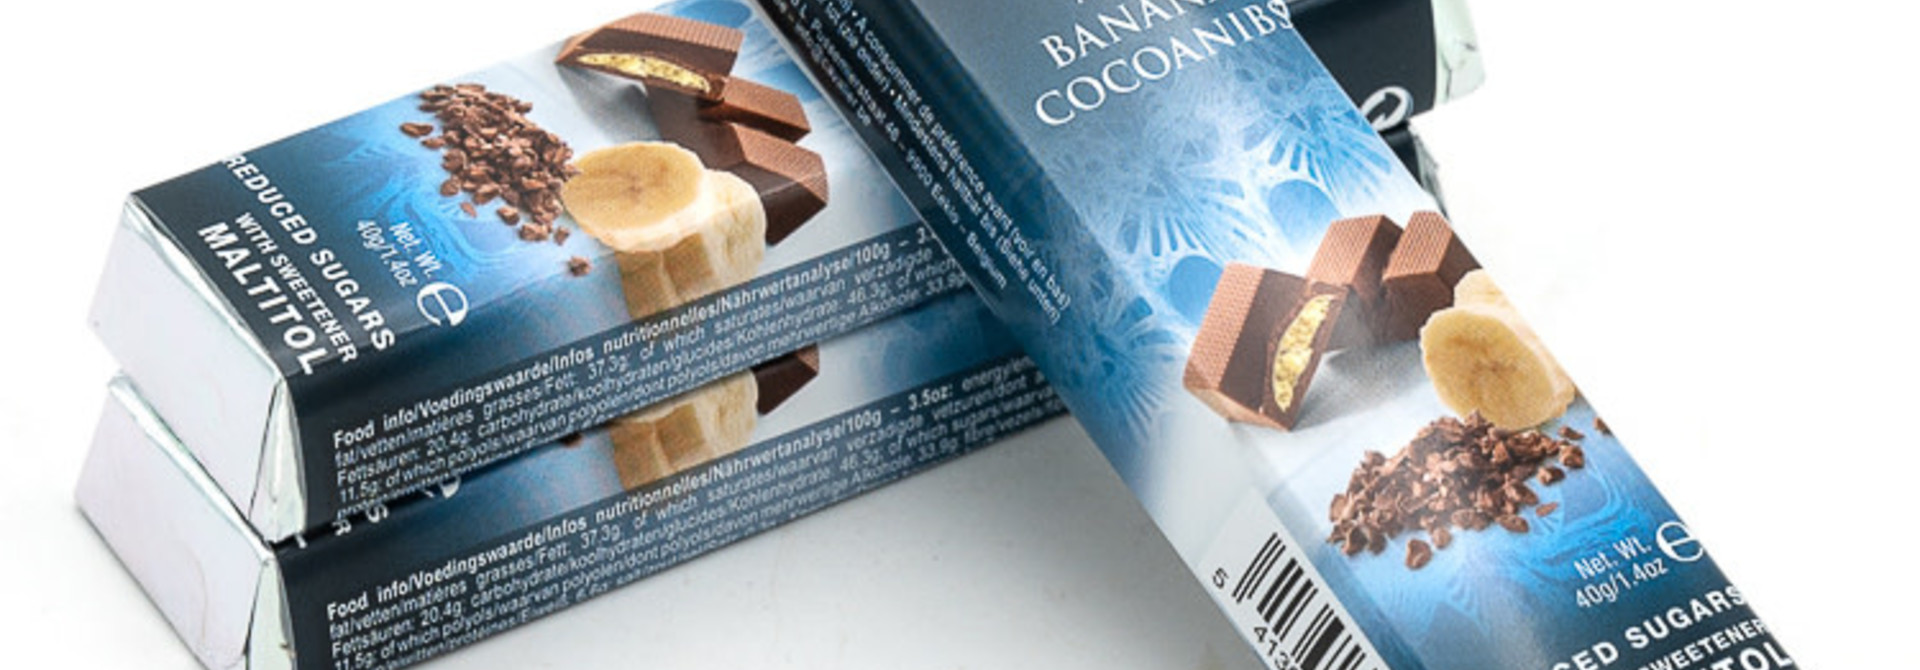 Cavalier Milk Banana Cocoanibs 40 Grs